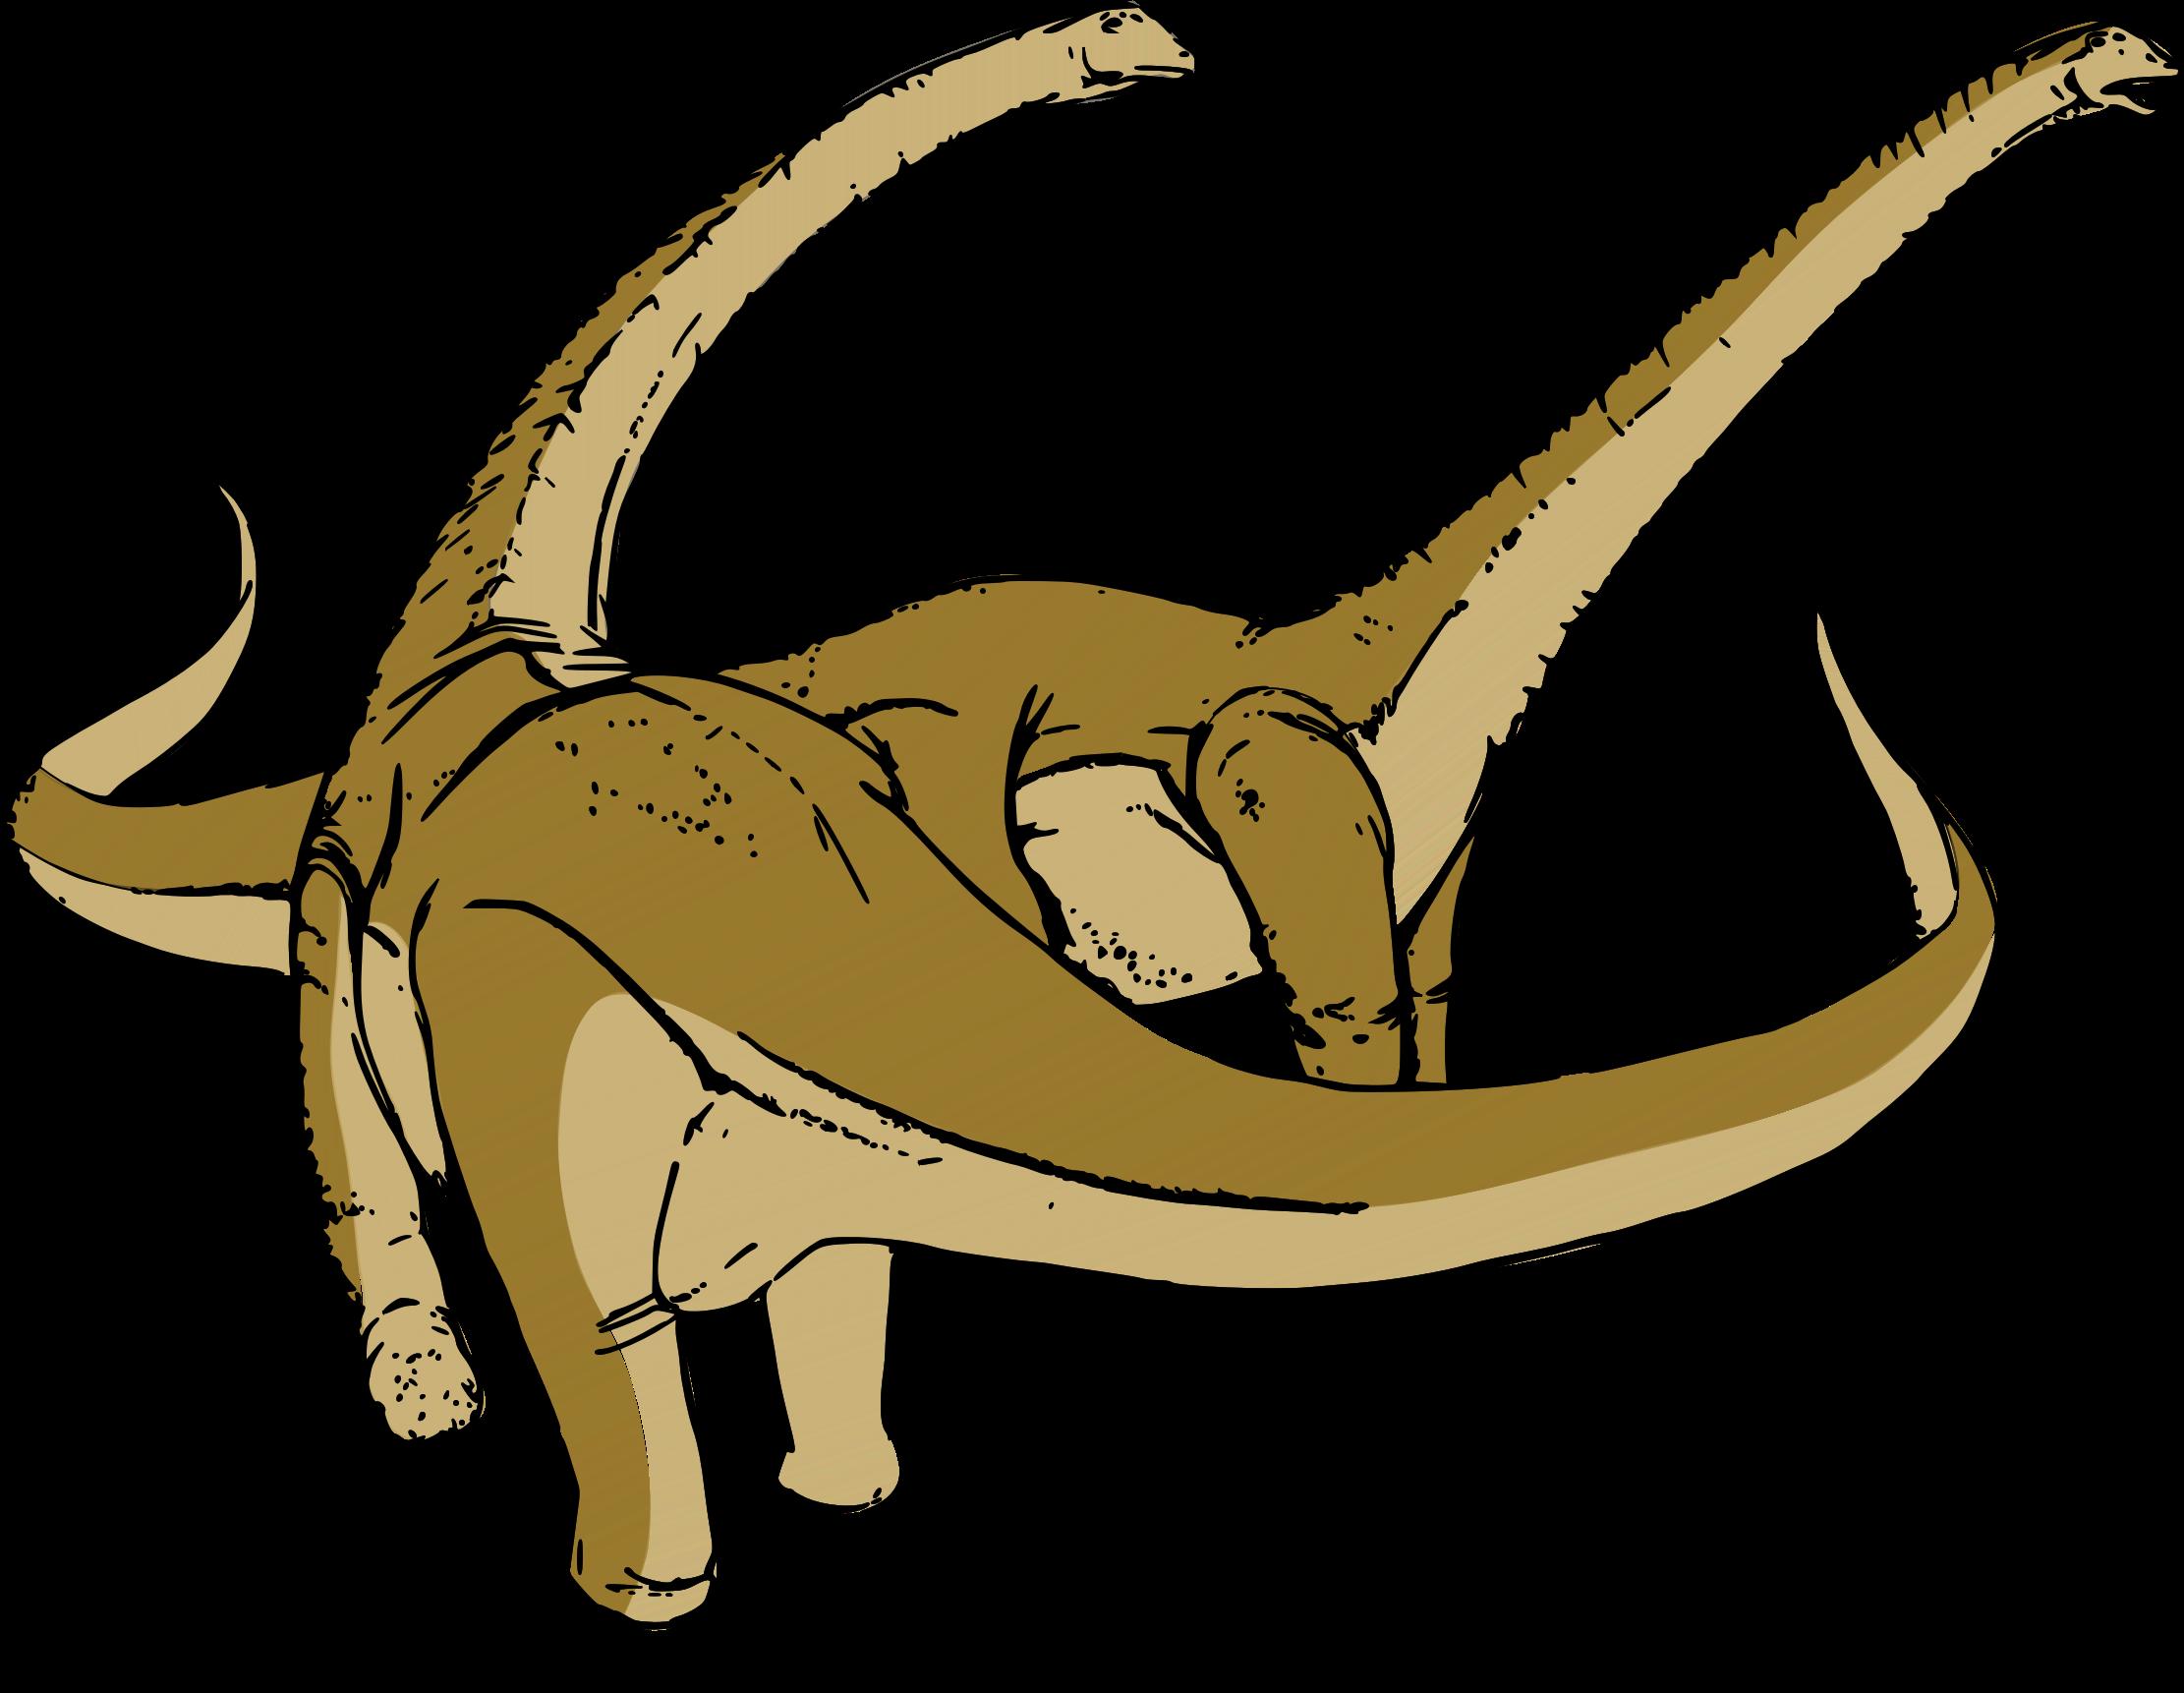 Nest clipart dinosaur. Alamosaurus big image png